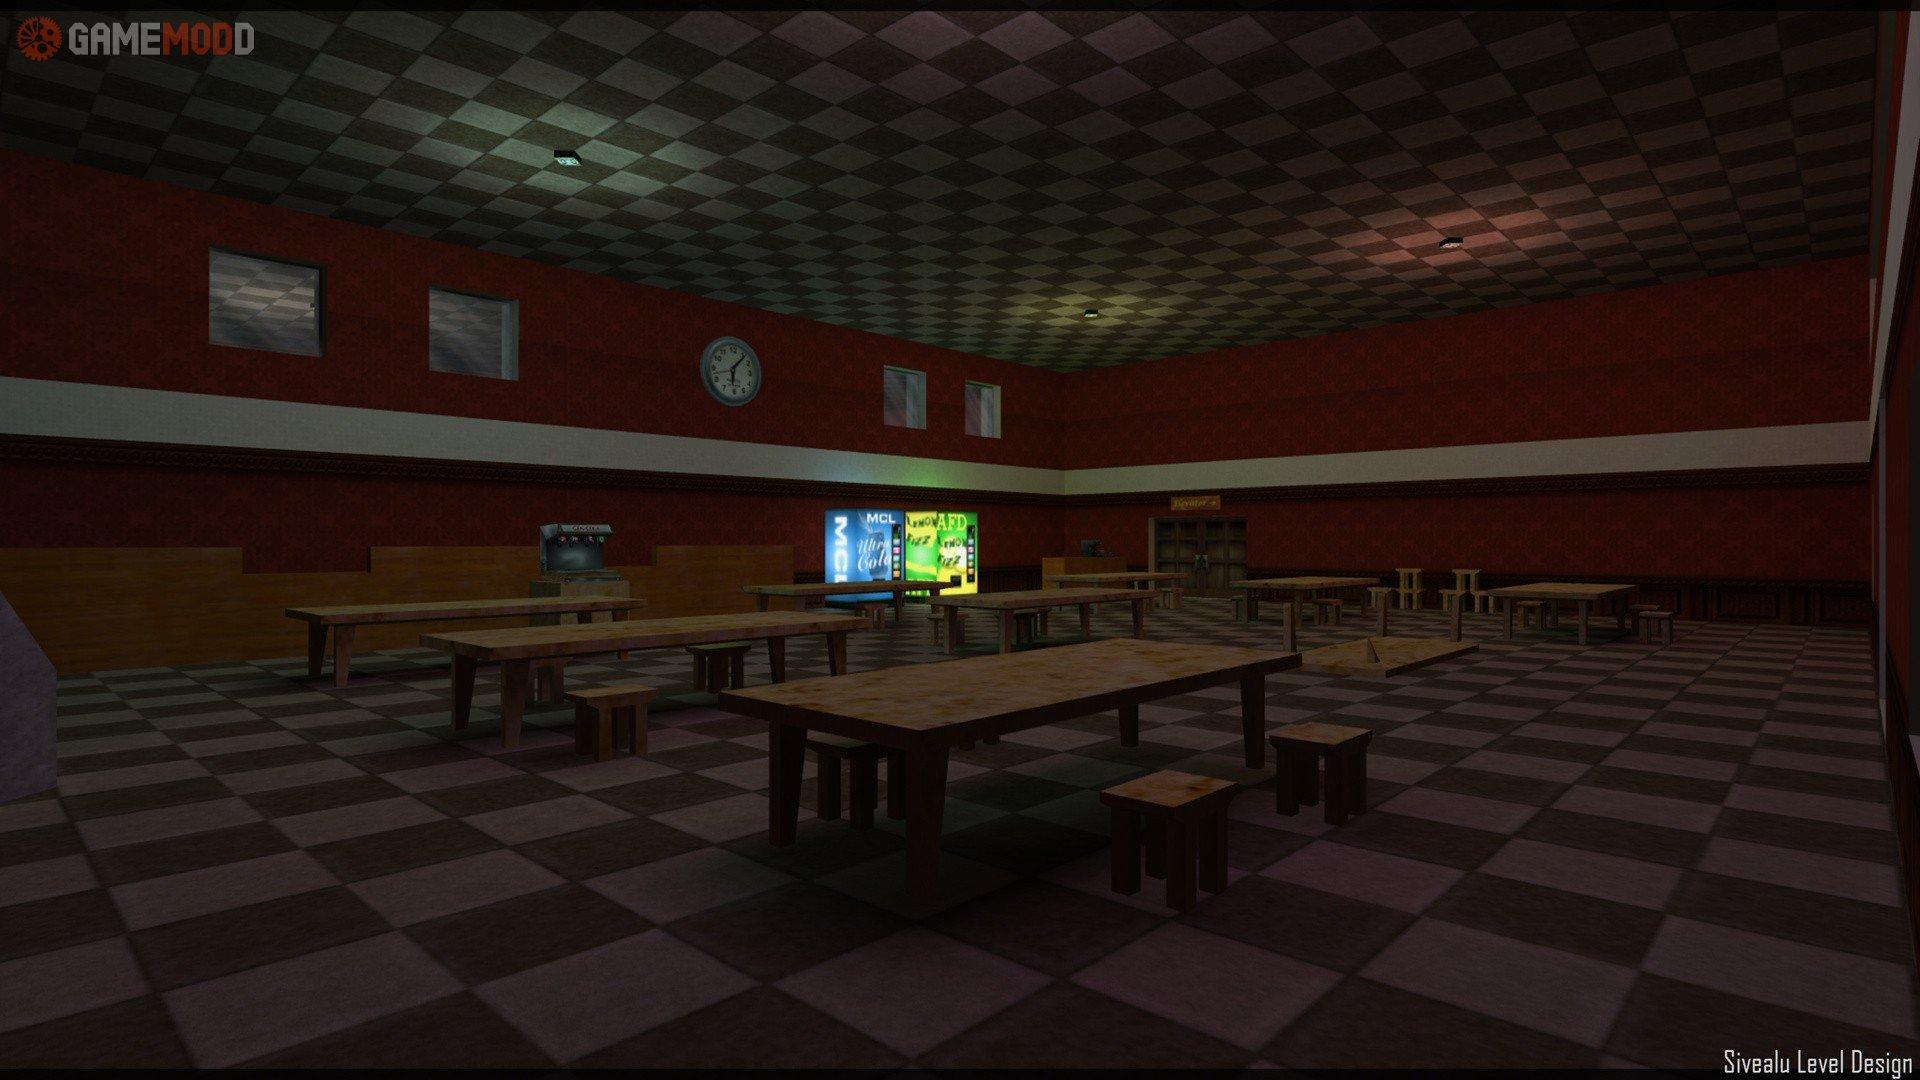 Fydmde_98_pro » CS 1.6 - Maps Battle Arena